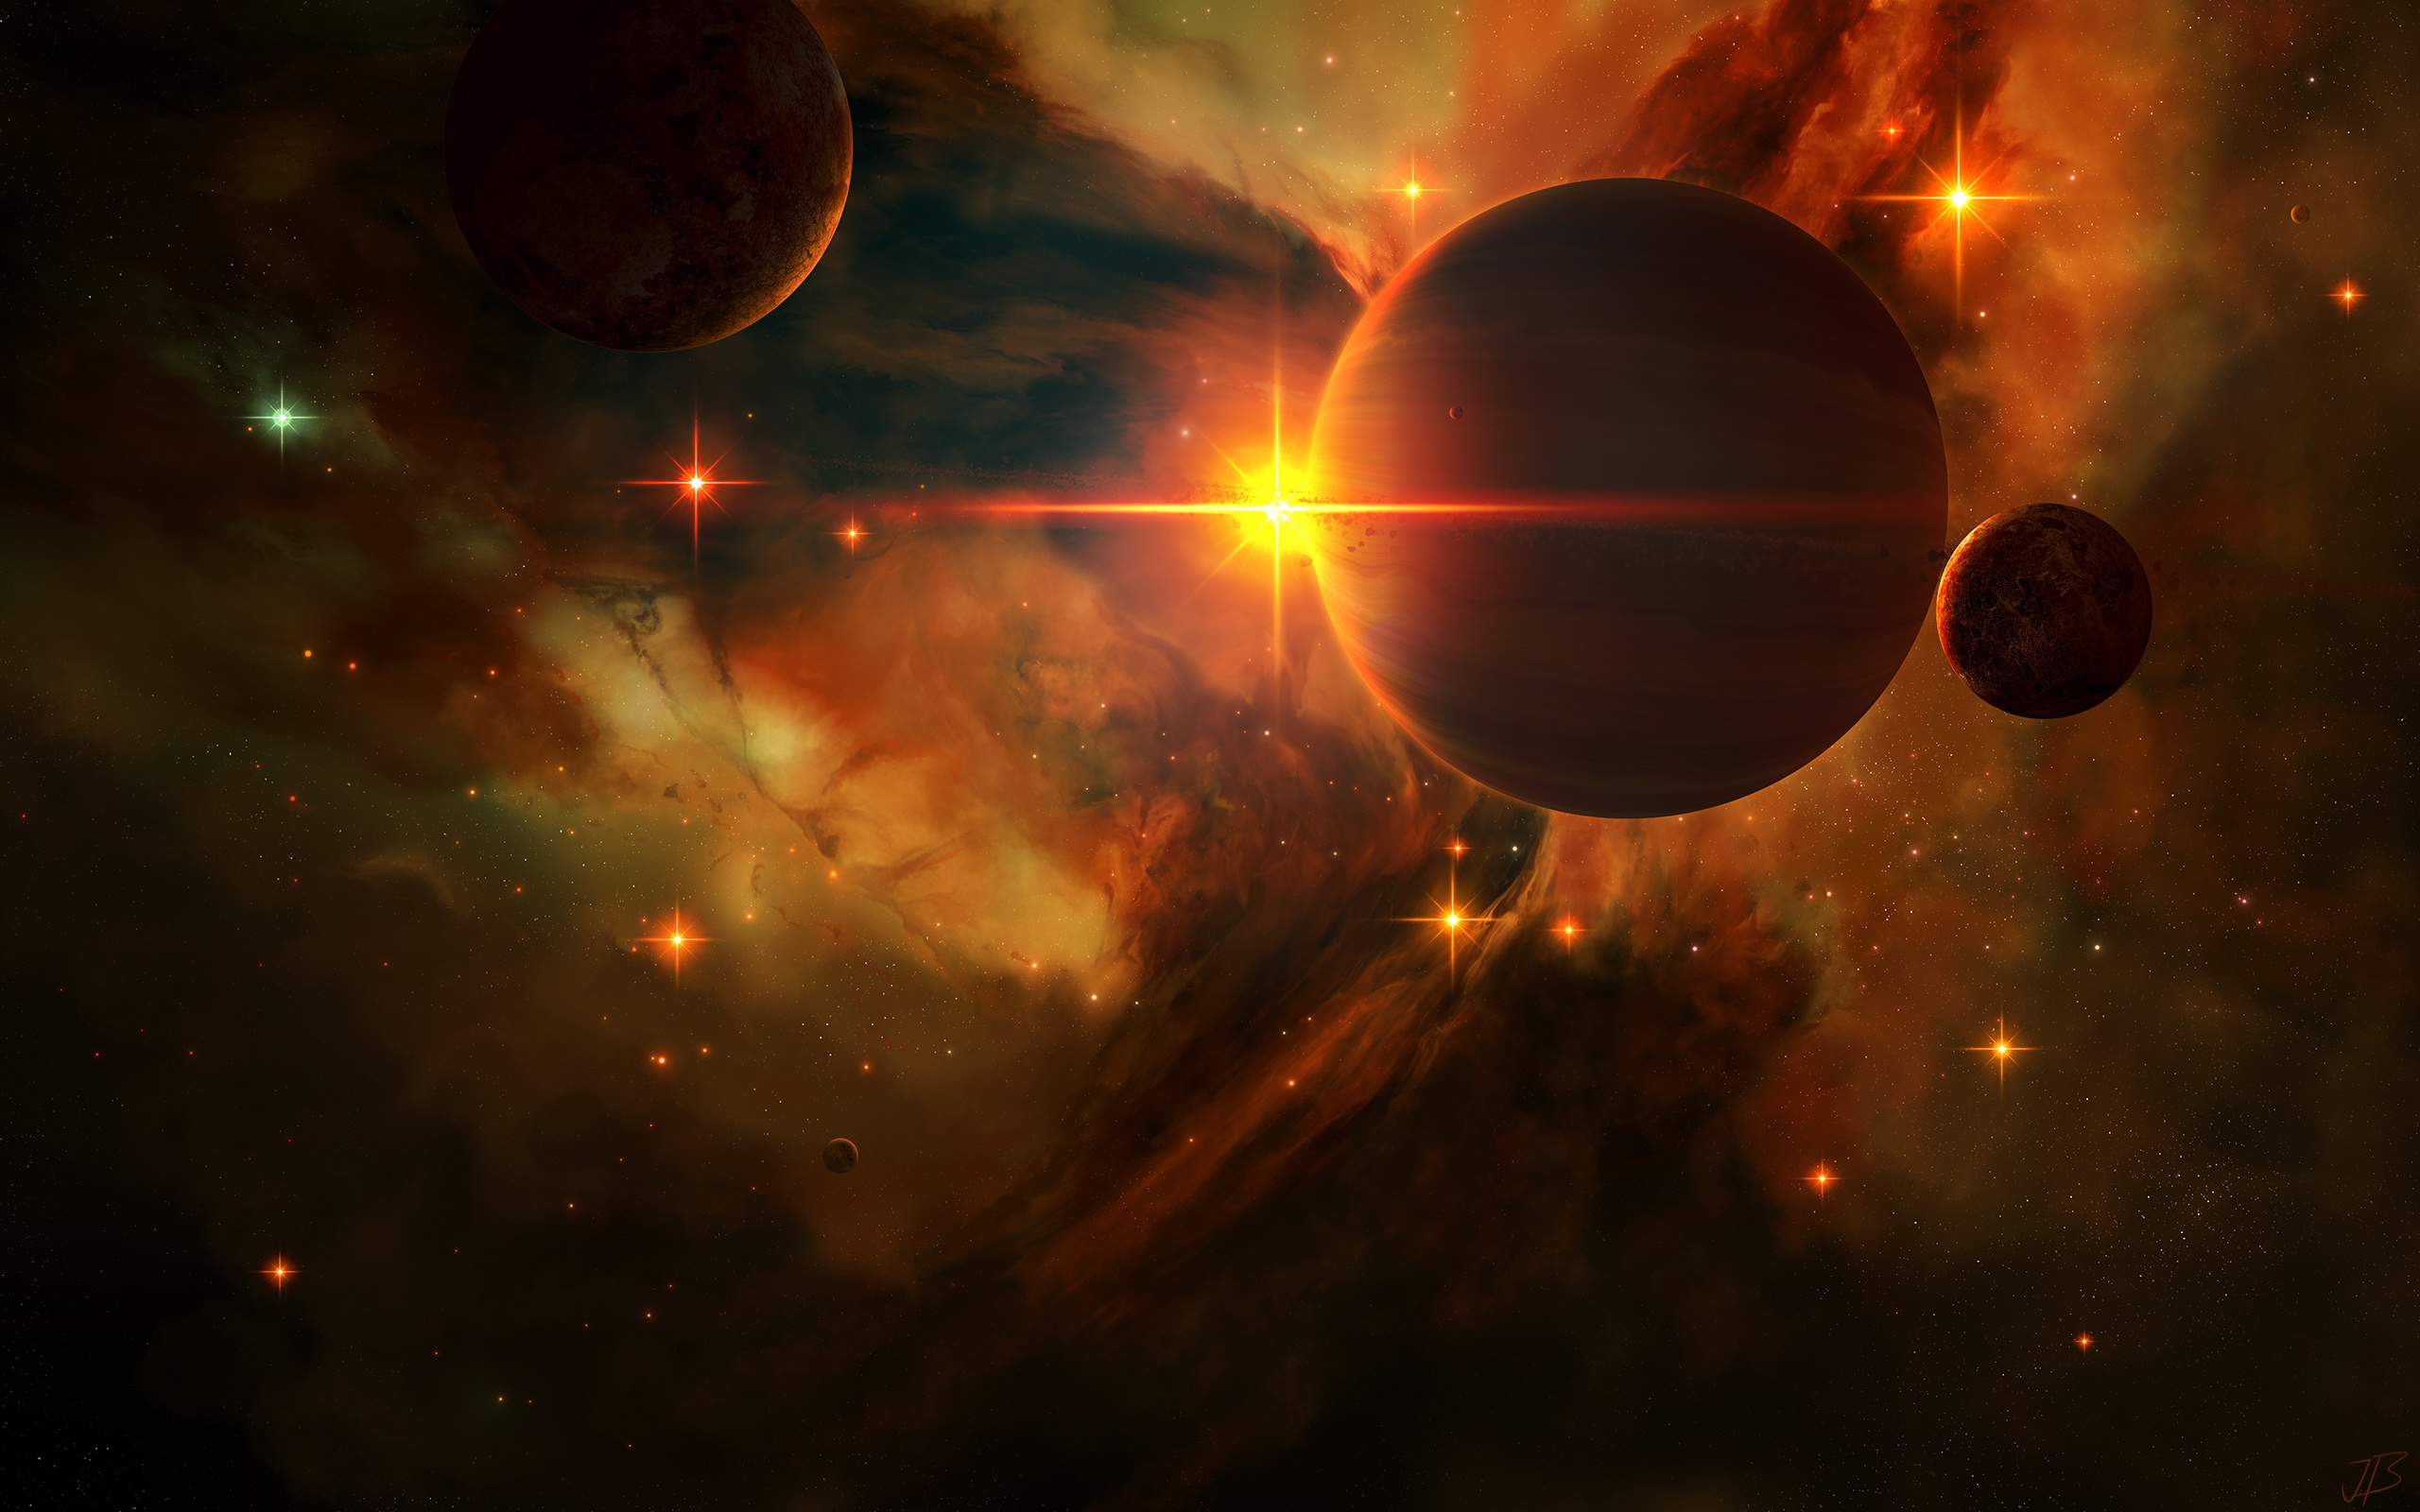 General 2560x1600 planet space space art digital art JoeyJazz